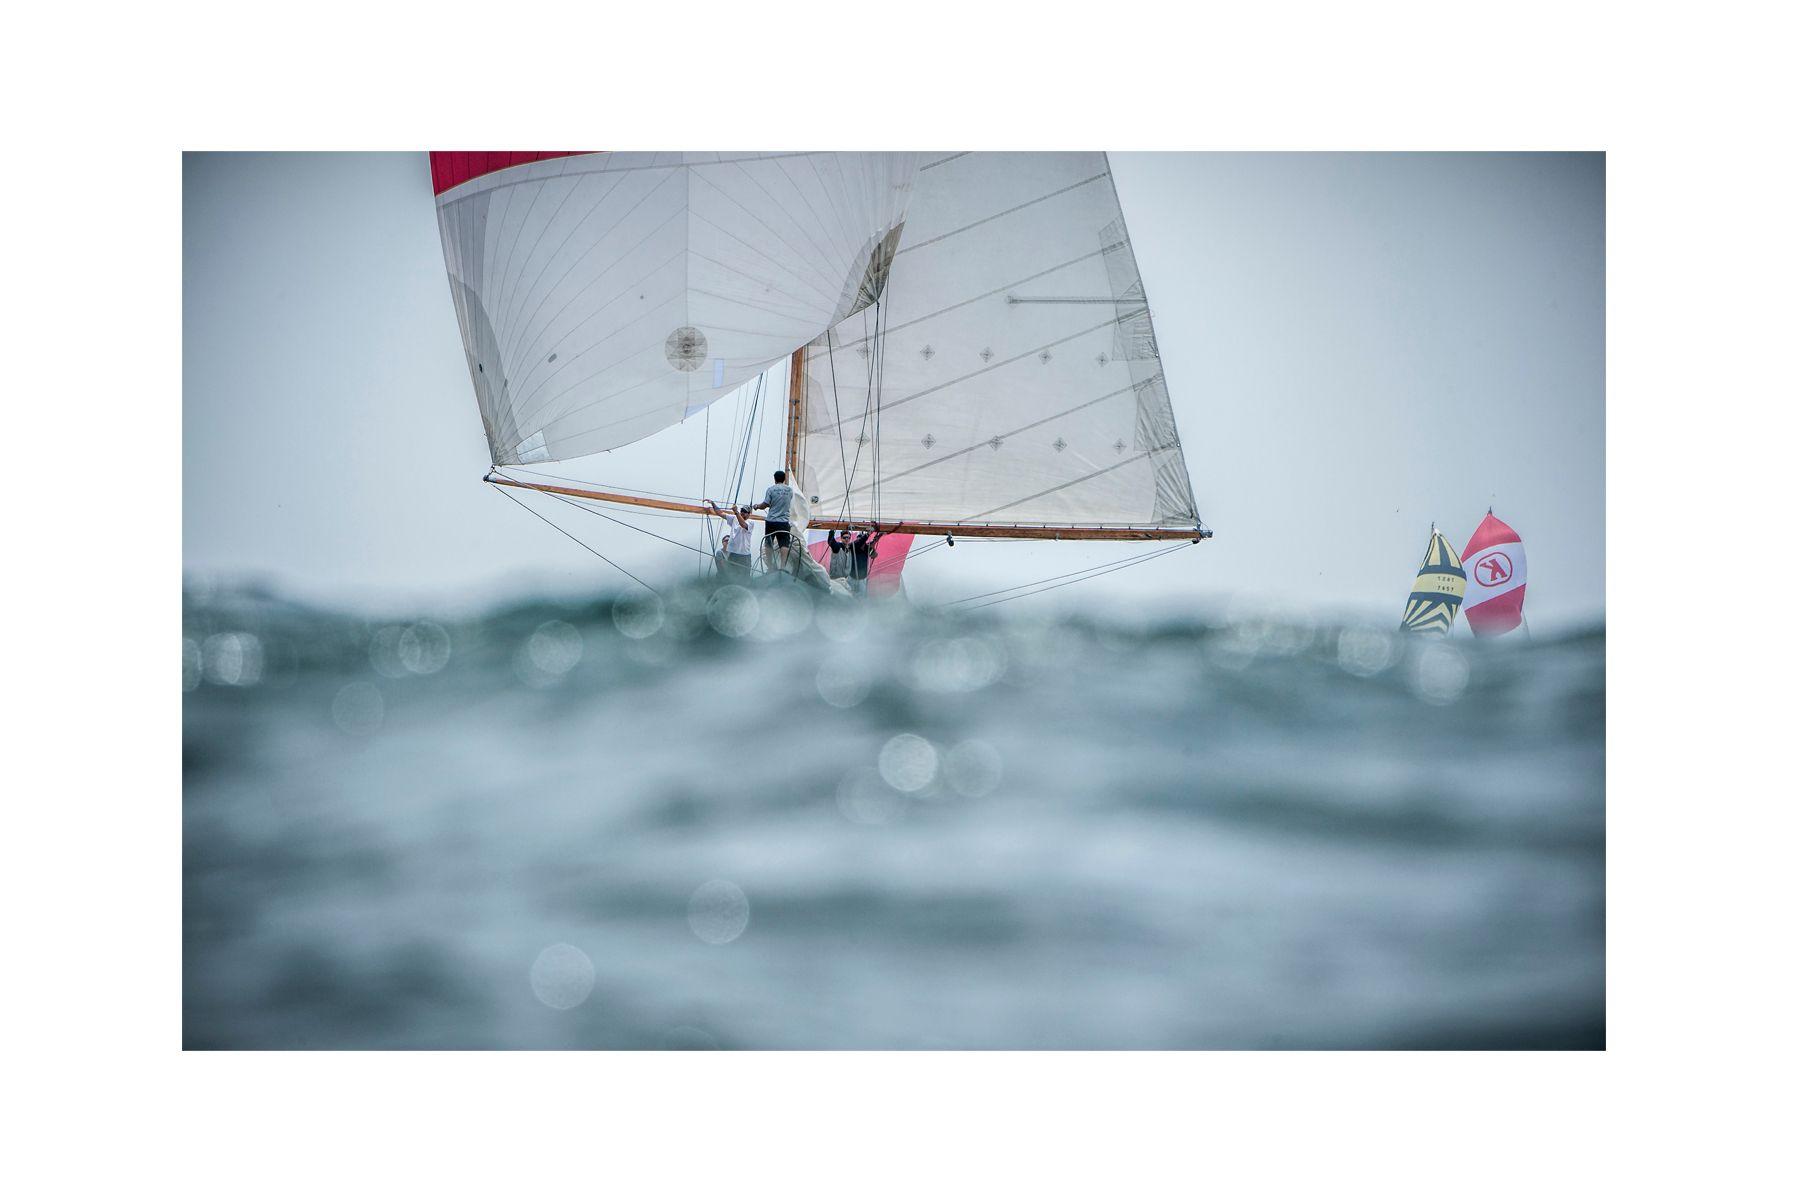 1_sailfestb2083_lb